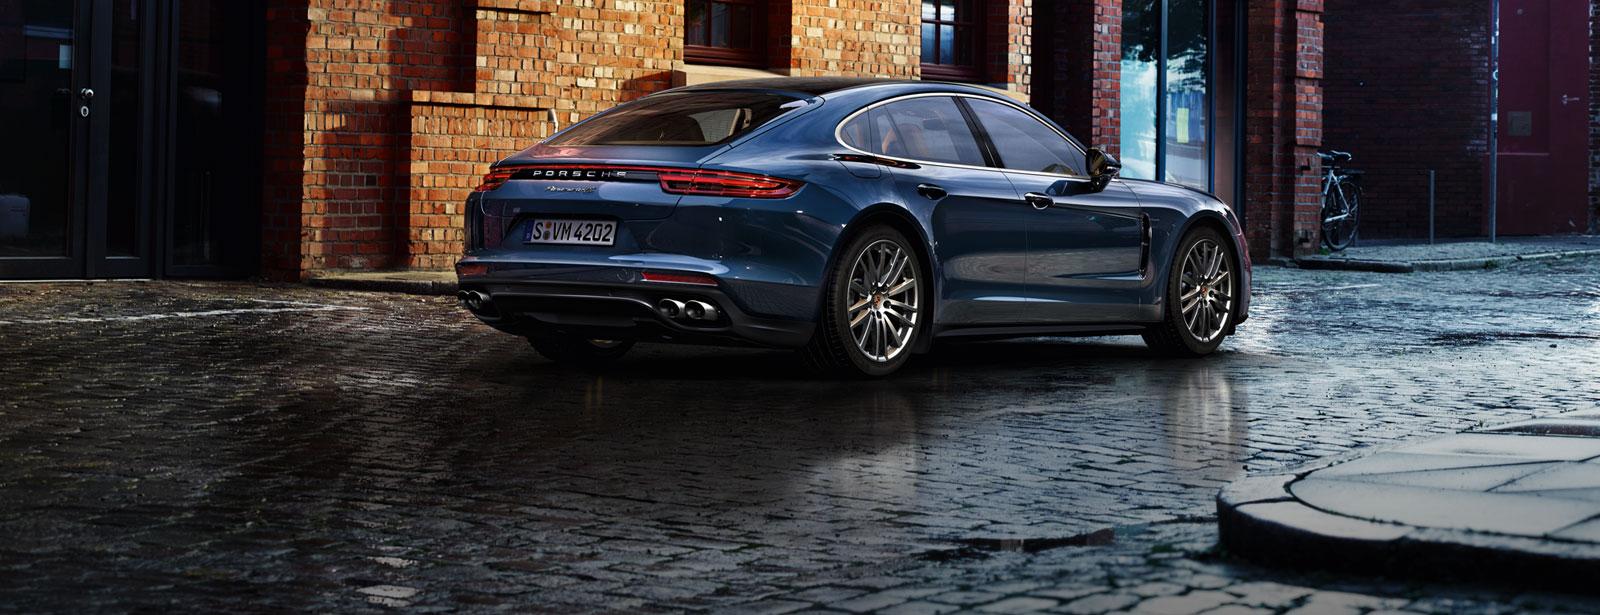 Porsche - Panamera 4S Diesel - Courage changes everything.